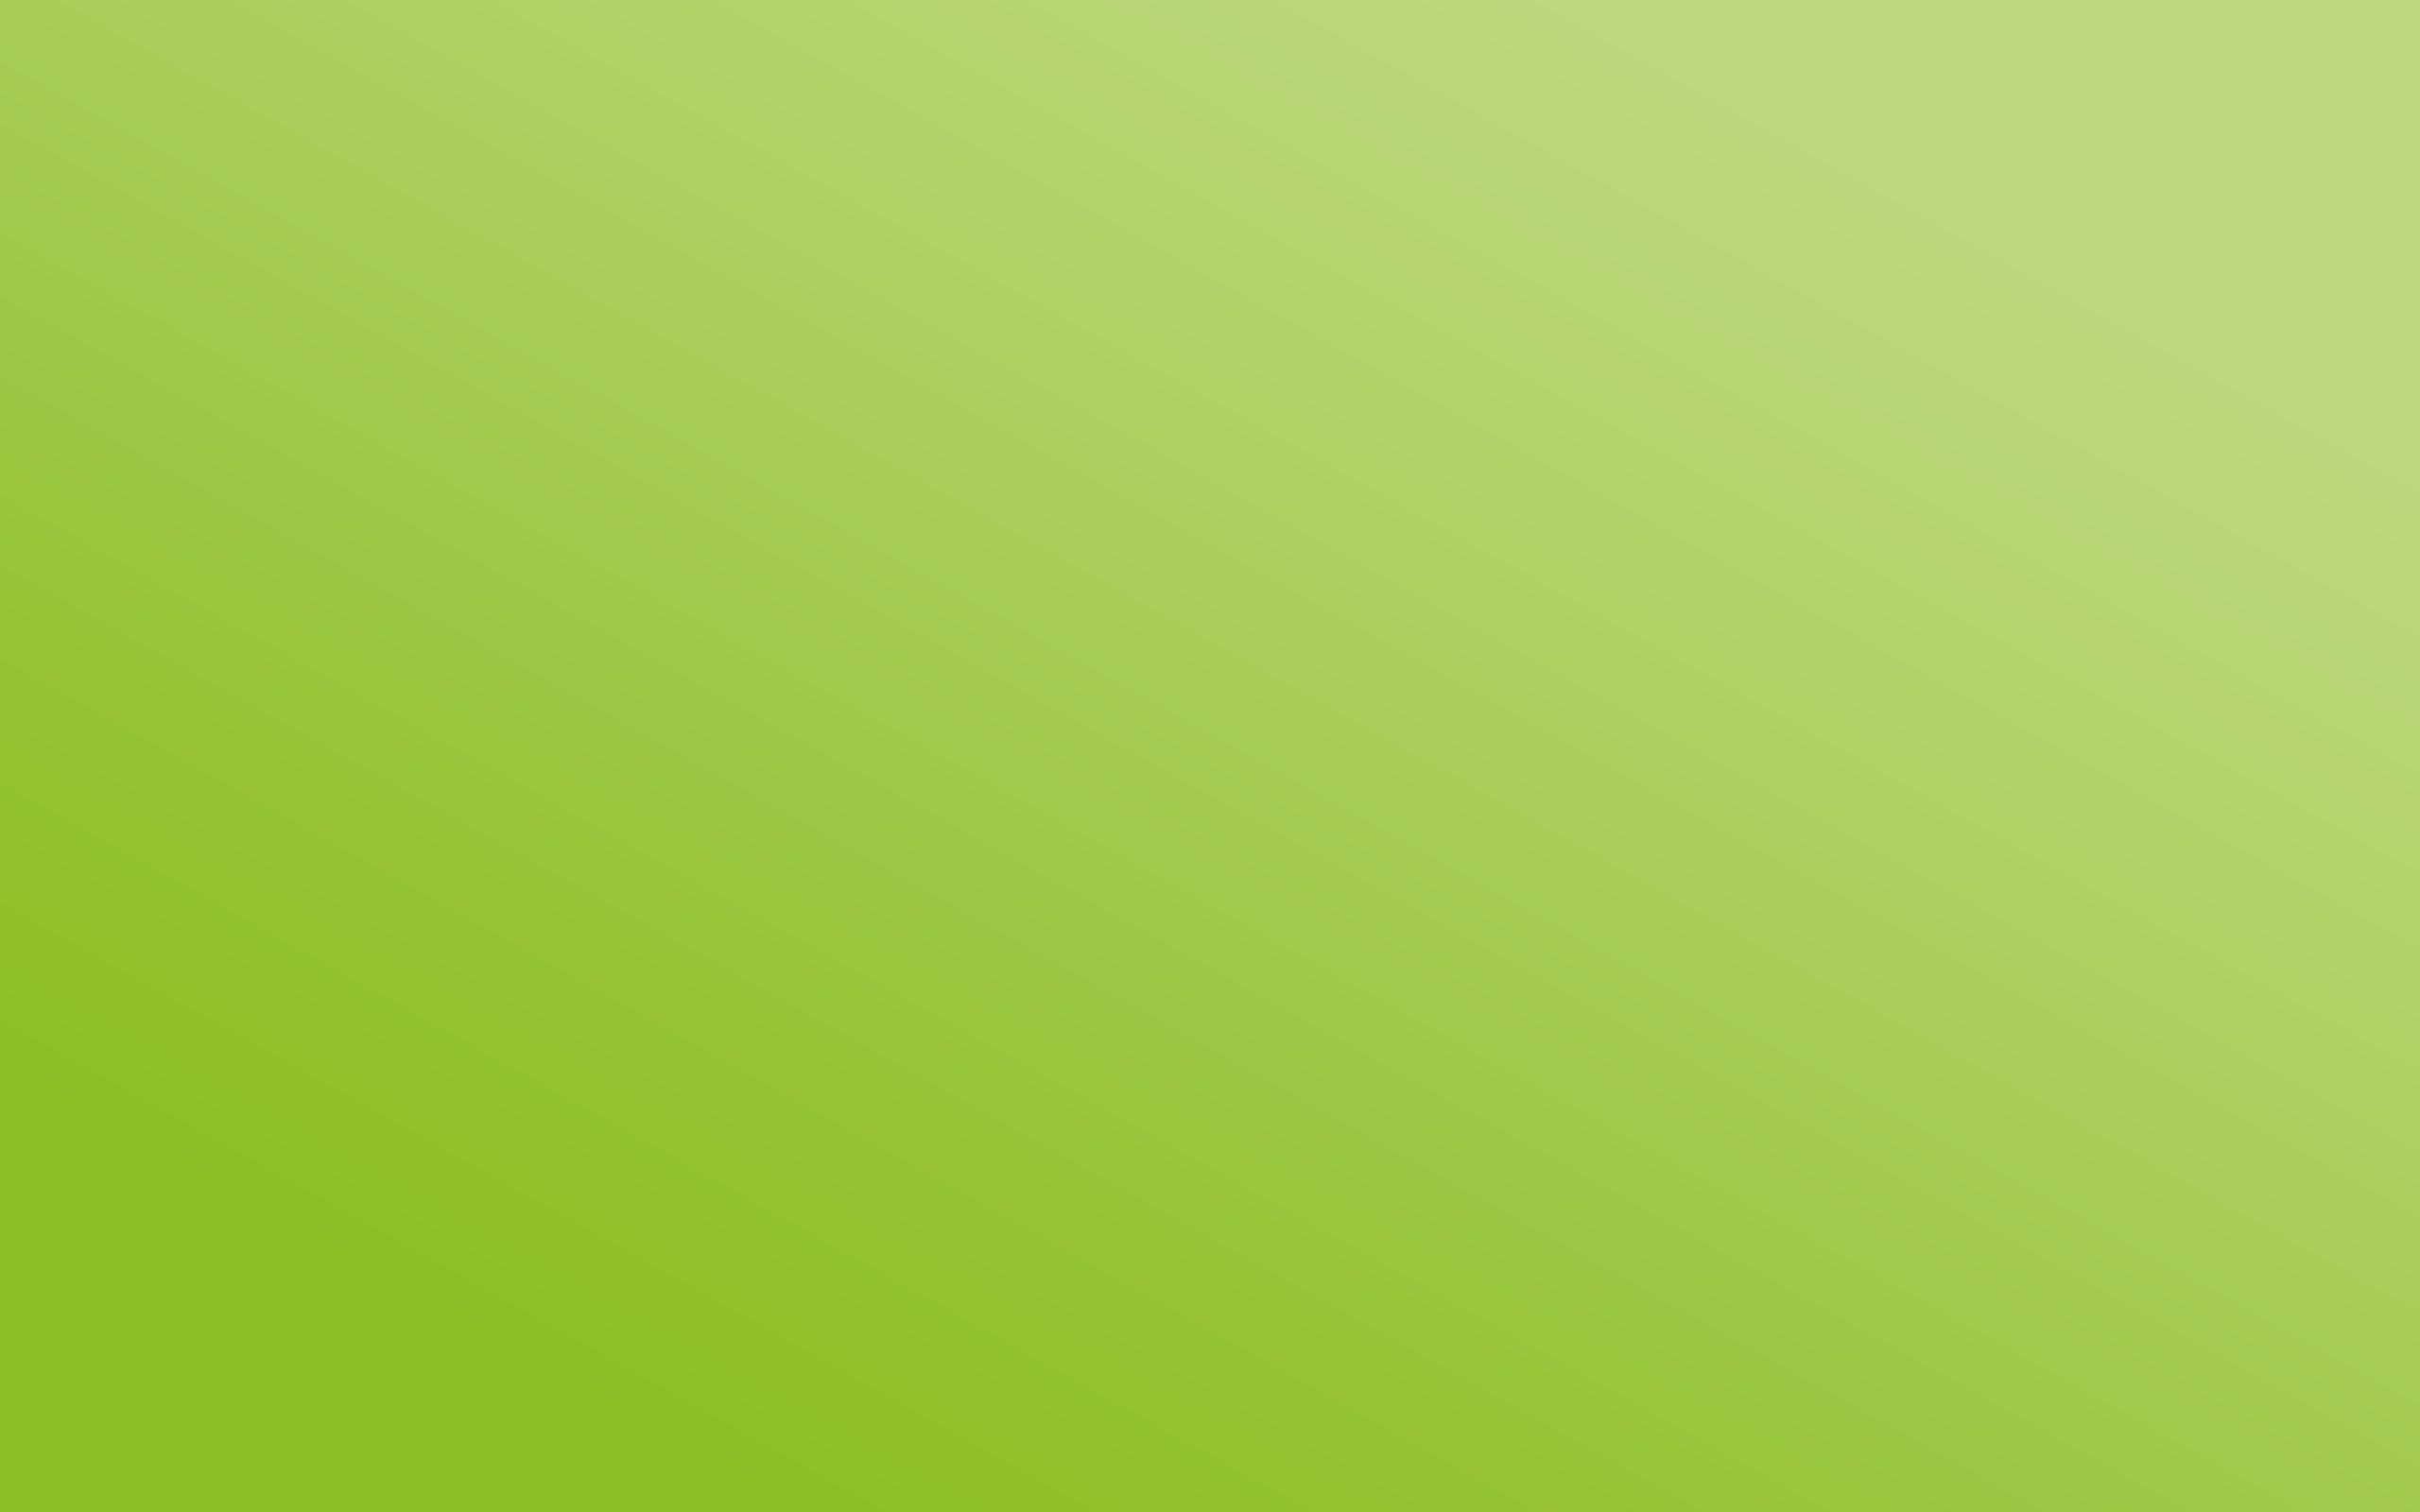 Wallpaper Light green, Solid, Color